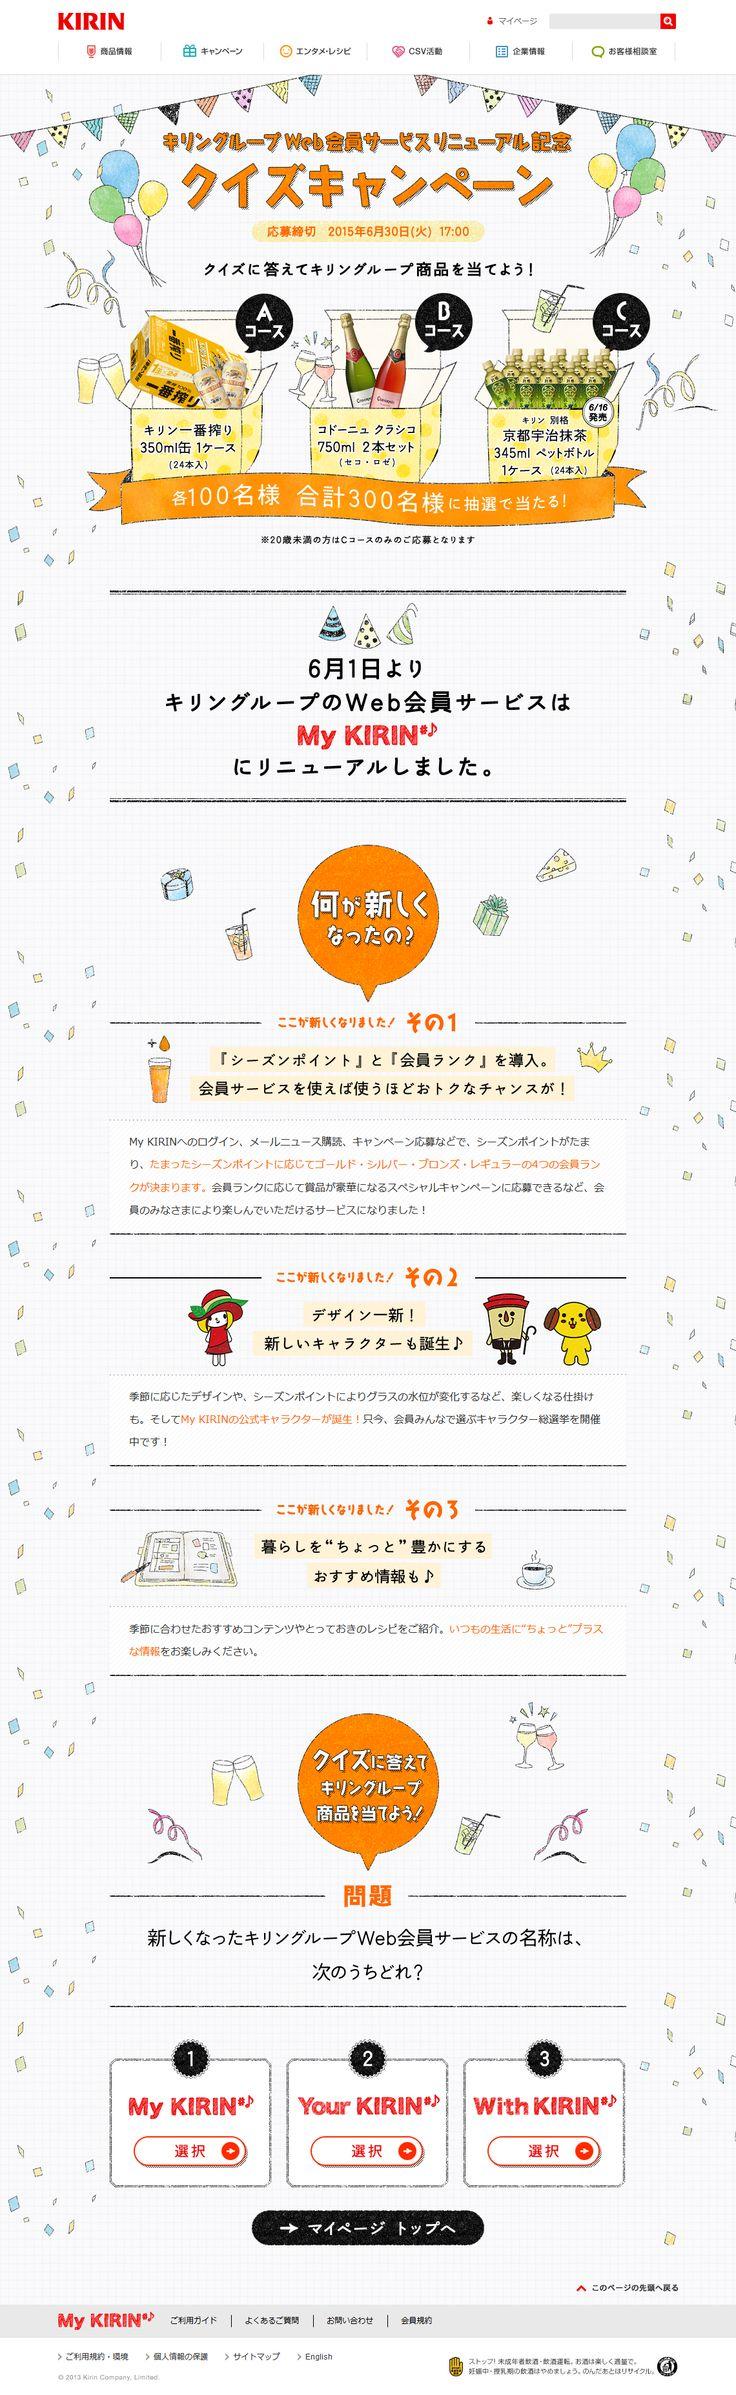 https://m.kirin.co.jp/group/renewal_campaign/